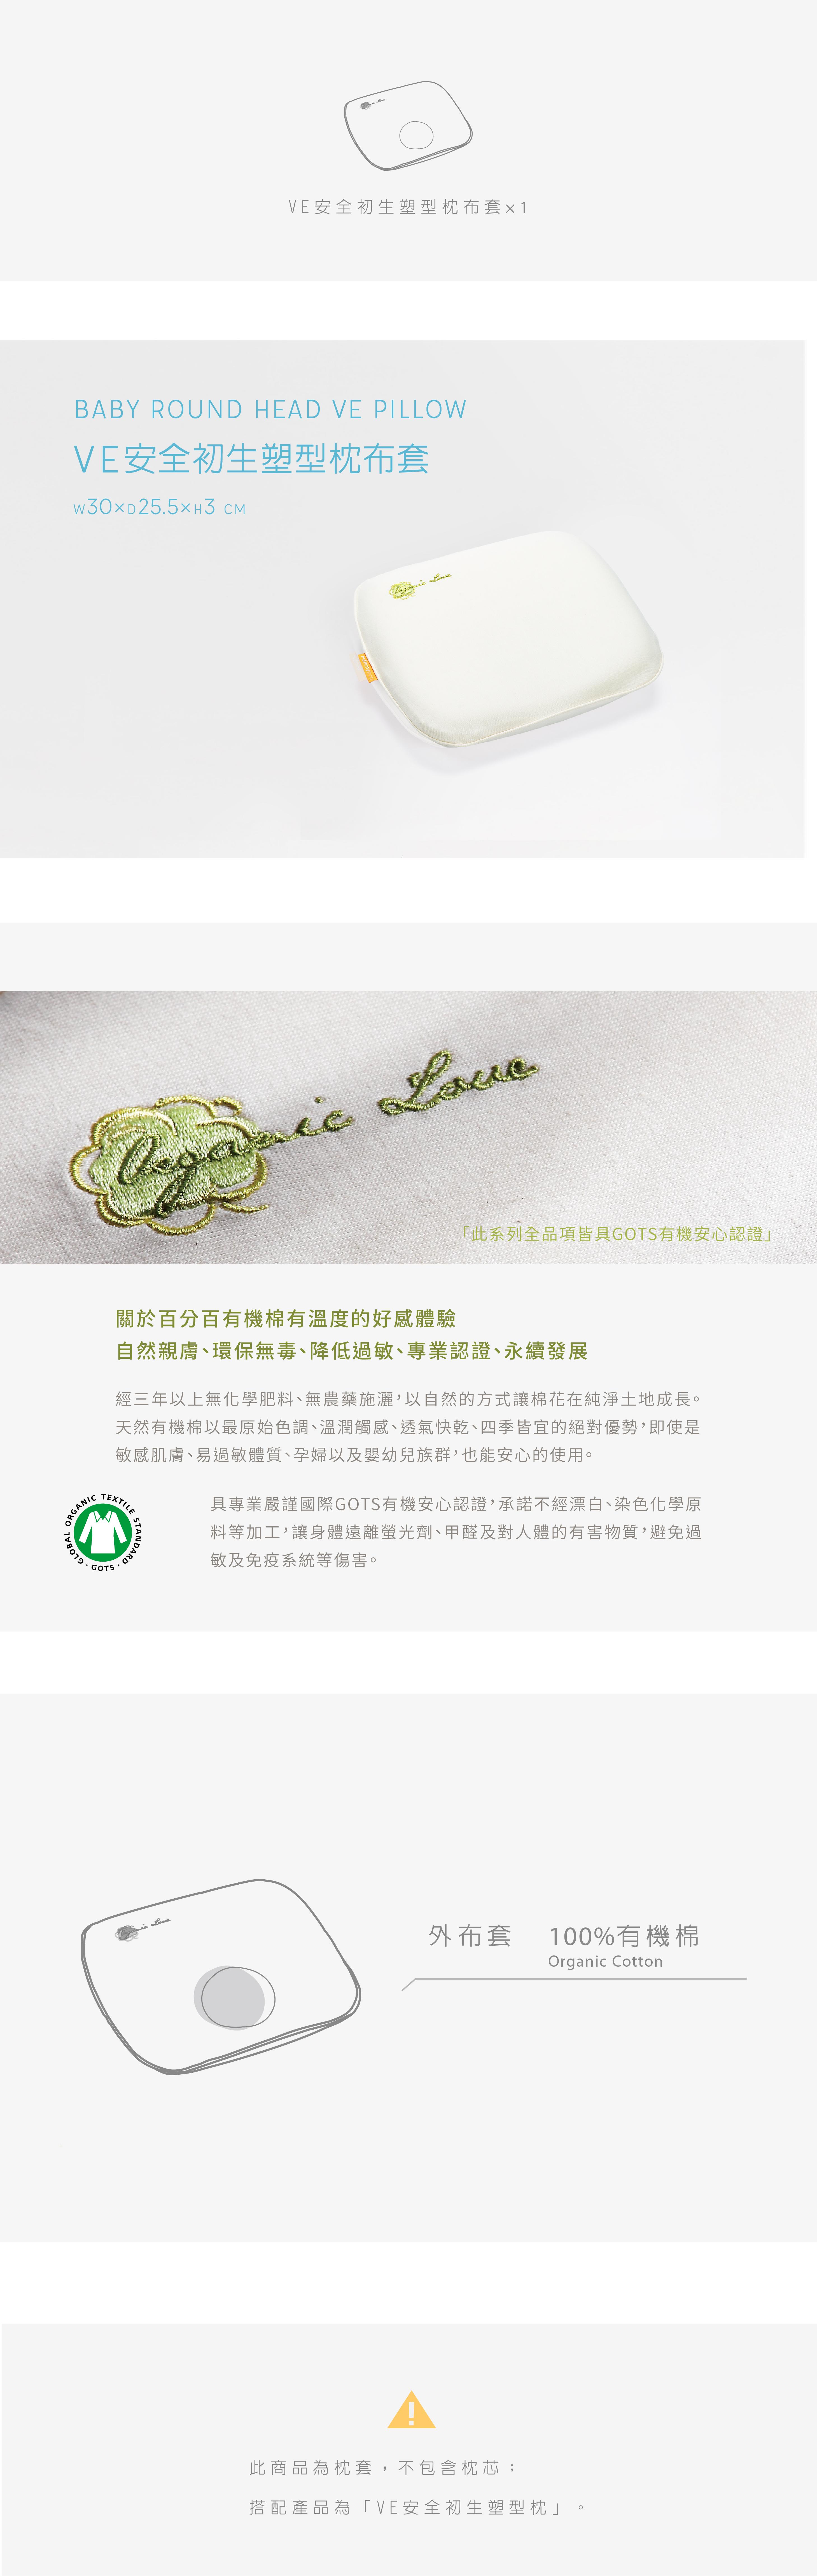 VE FOAM-系列布套-安全初生塑型枕